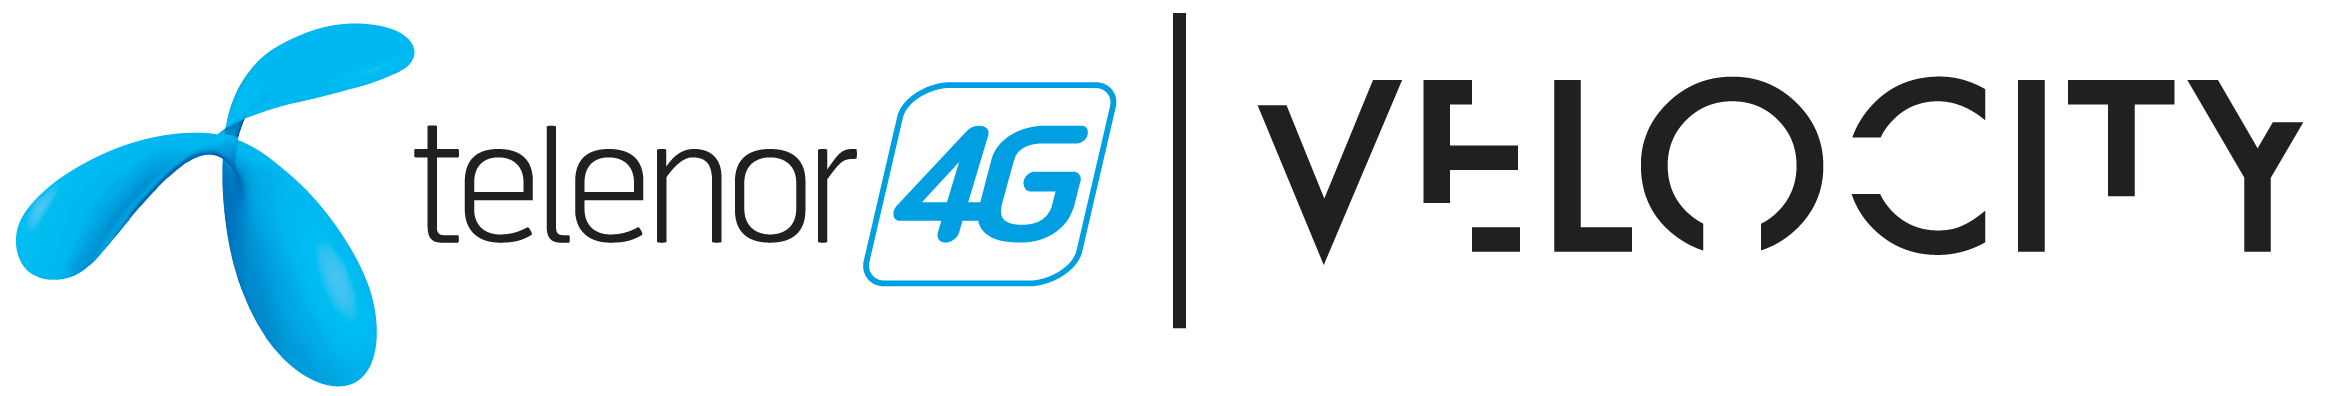 Telenor Velocity - Telenor PNG